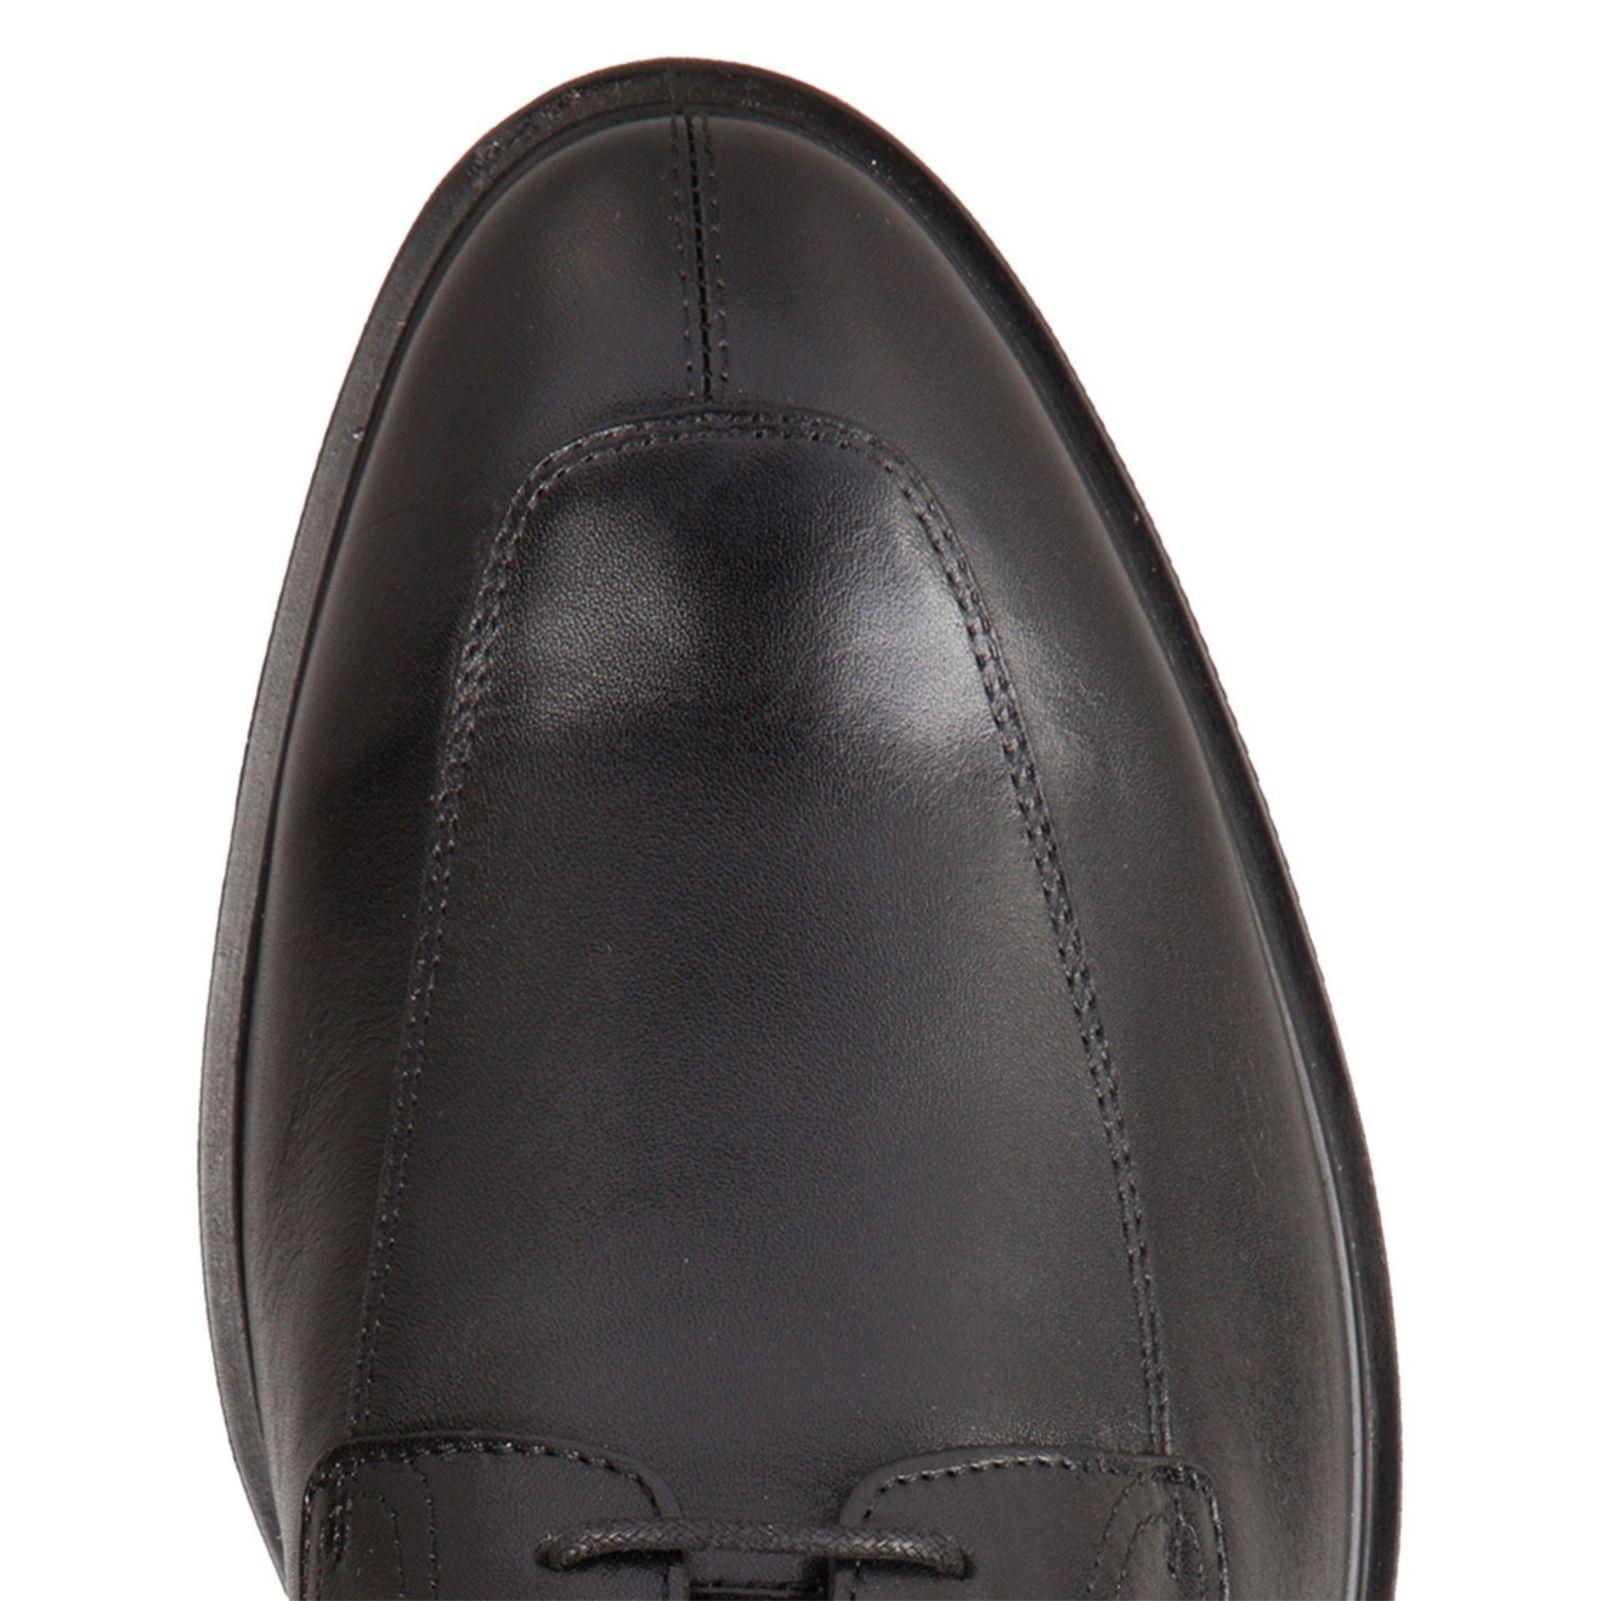 کفش رسمی چرم مردانه - جی اوکس - مشکي - 5